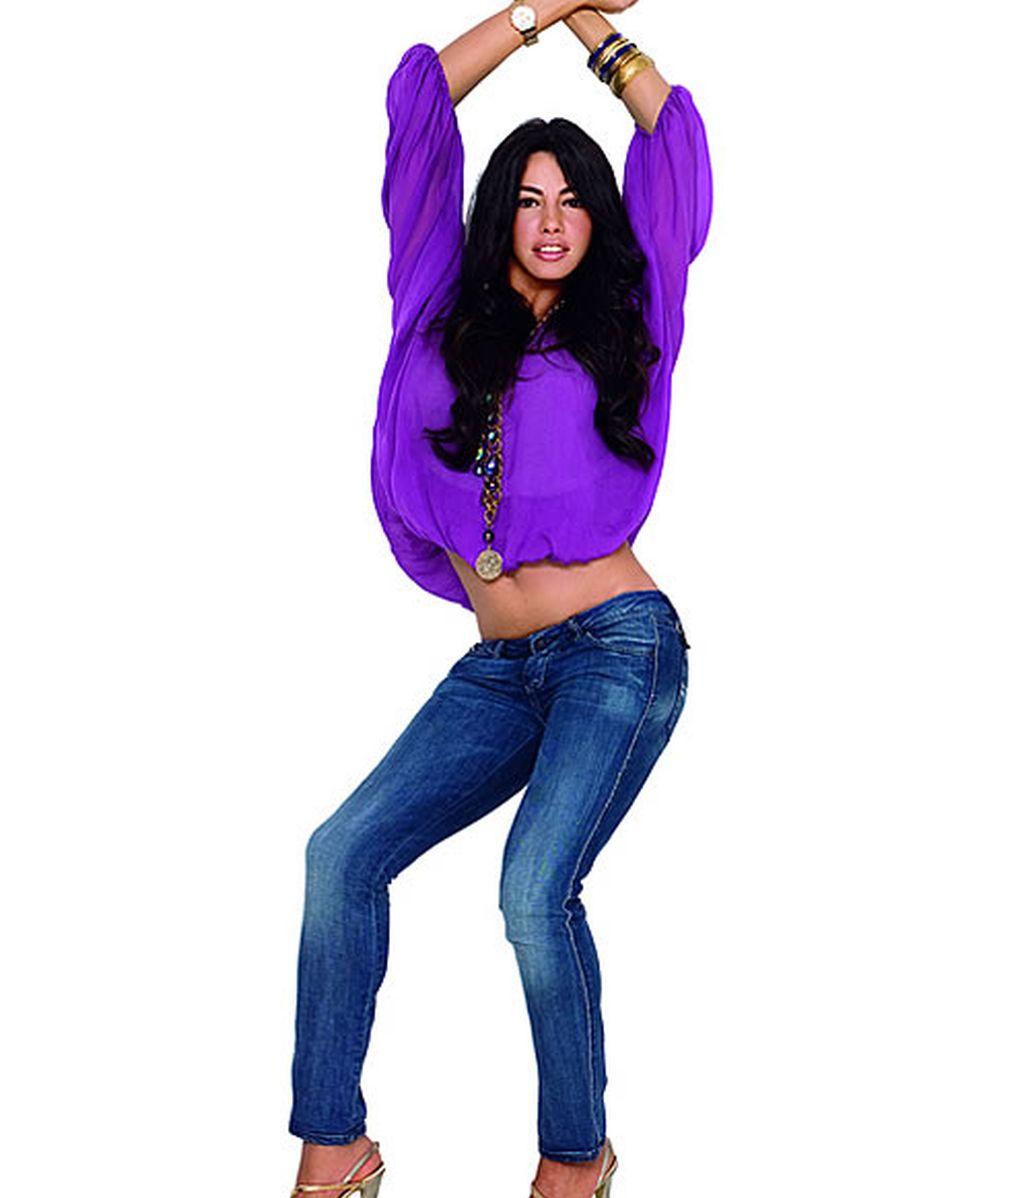 Marbelys Zamora. Fama ¡A bailar!